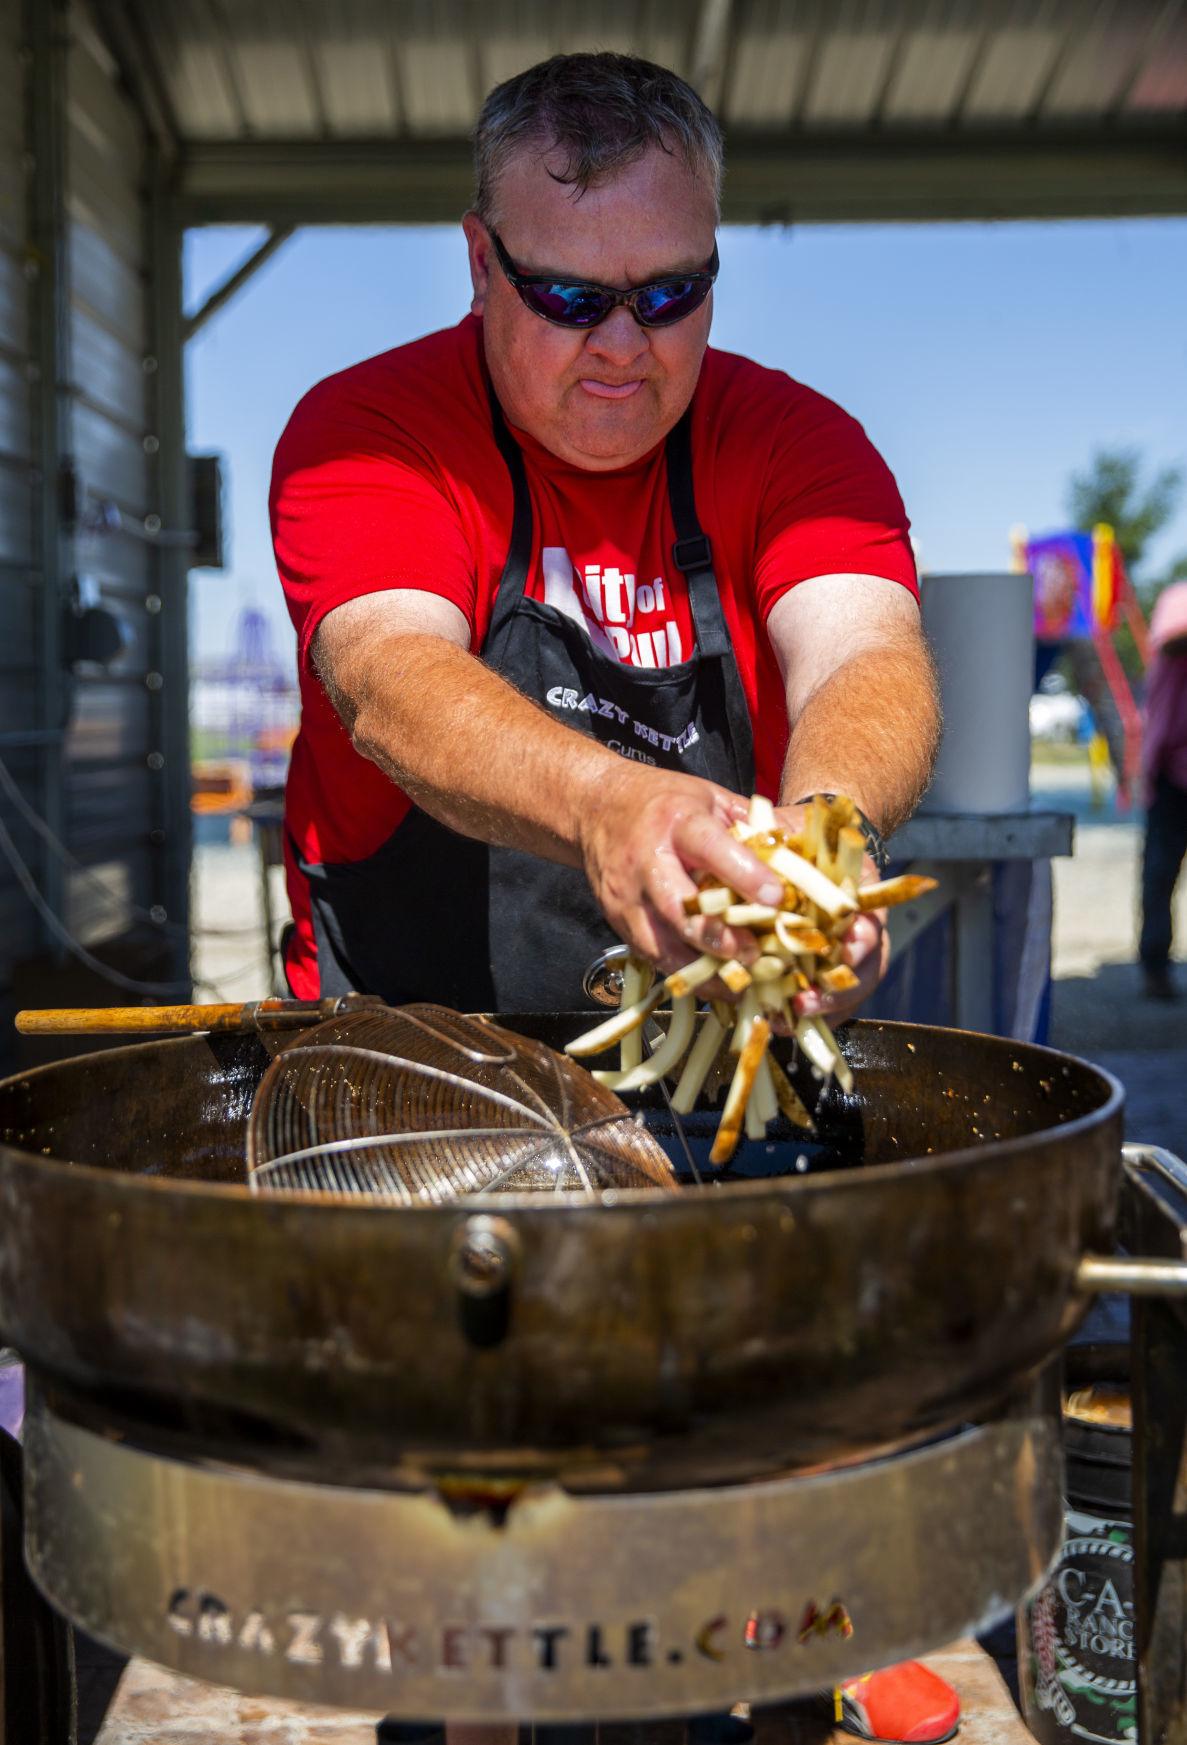 Paul Palooza feeds community